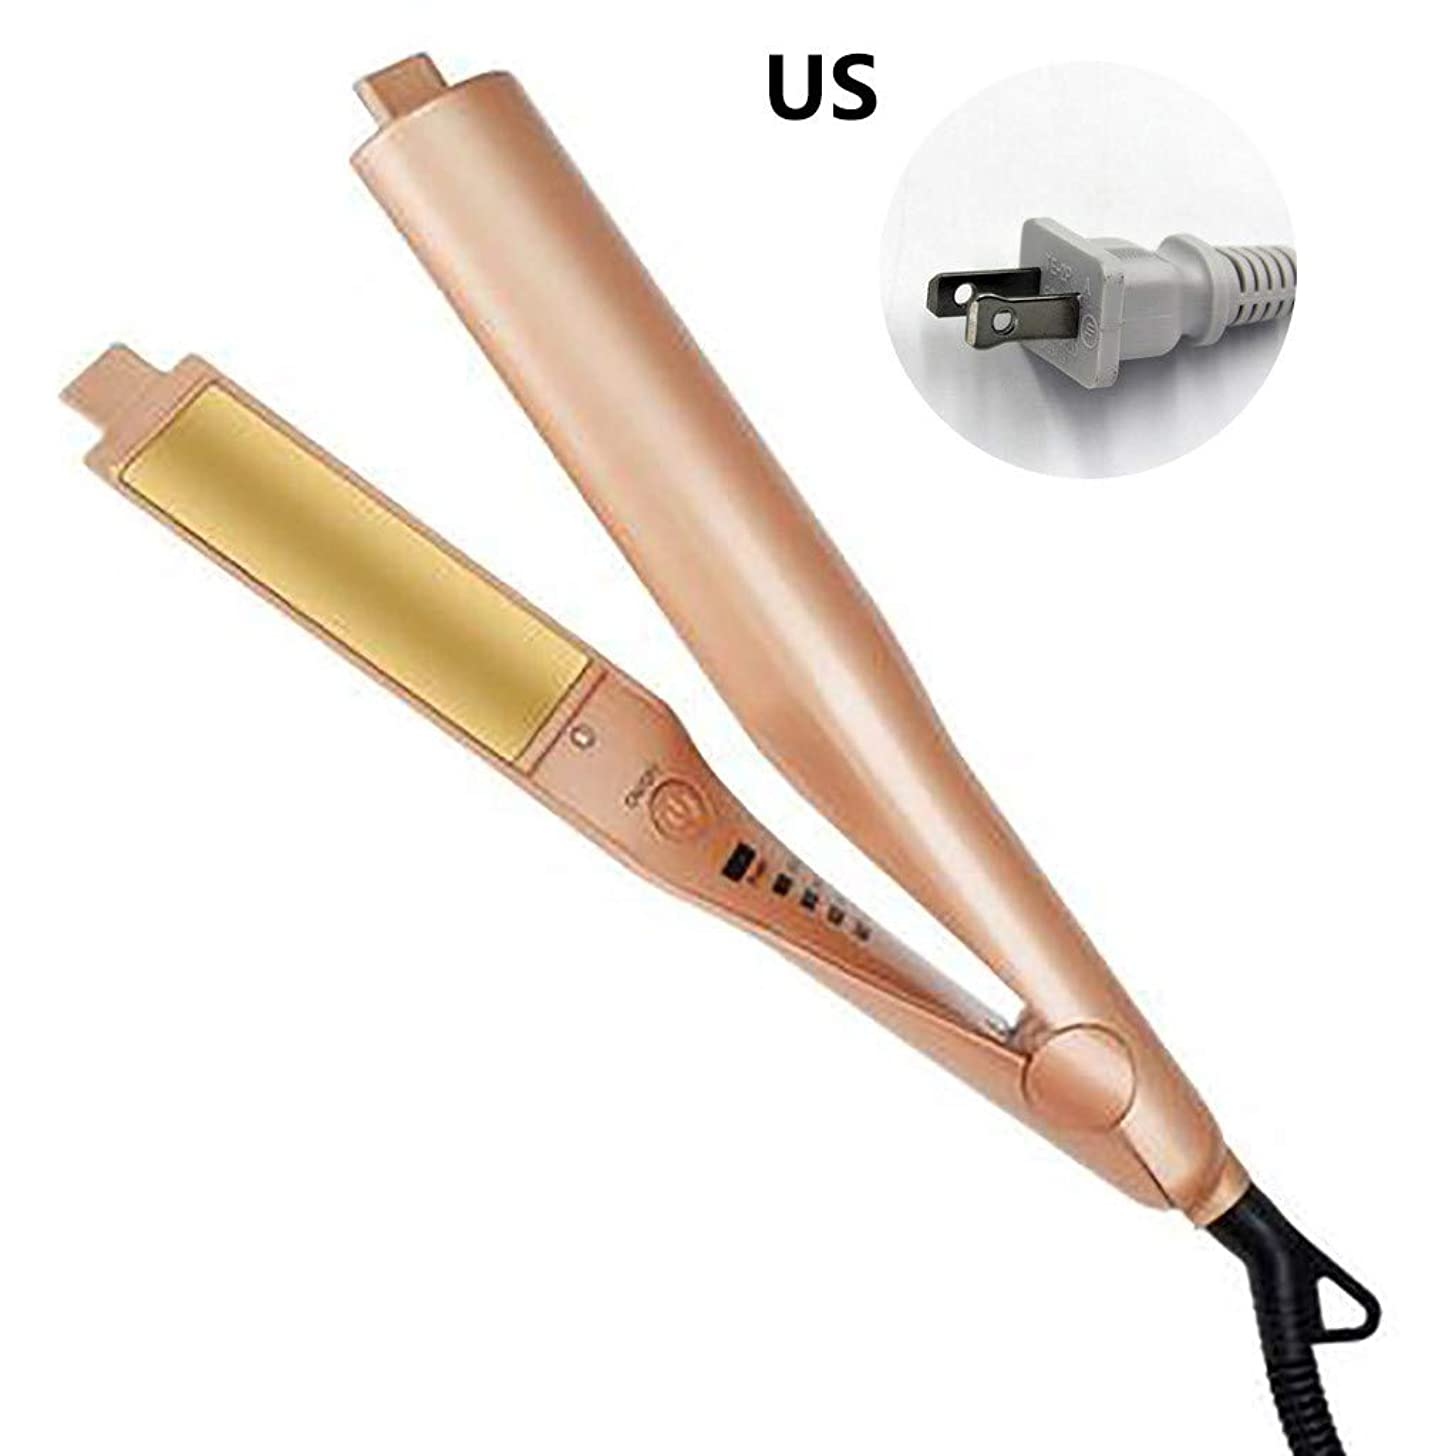 Hoshell_Beauty Hair Curler,??Hoshell?? Hair Curler Iron for Hair Straightening Ceramic Plate with Auto Shut Off